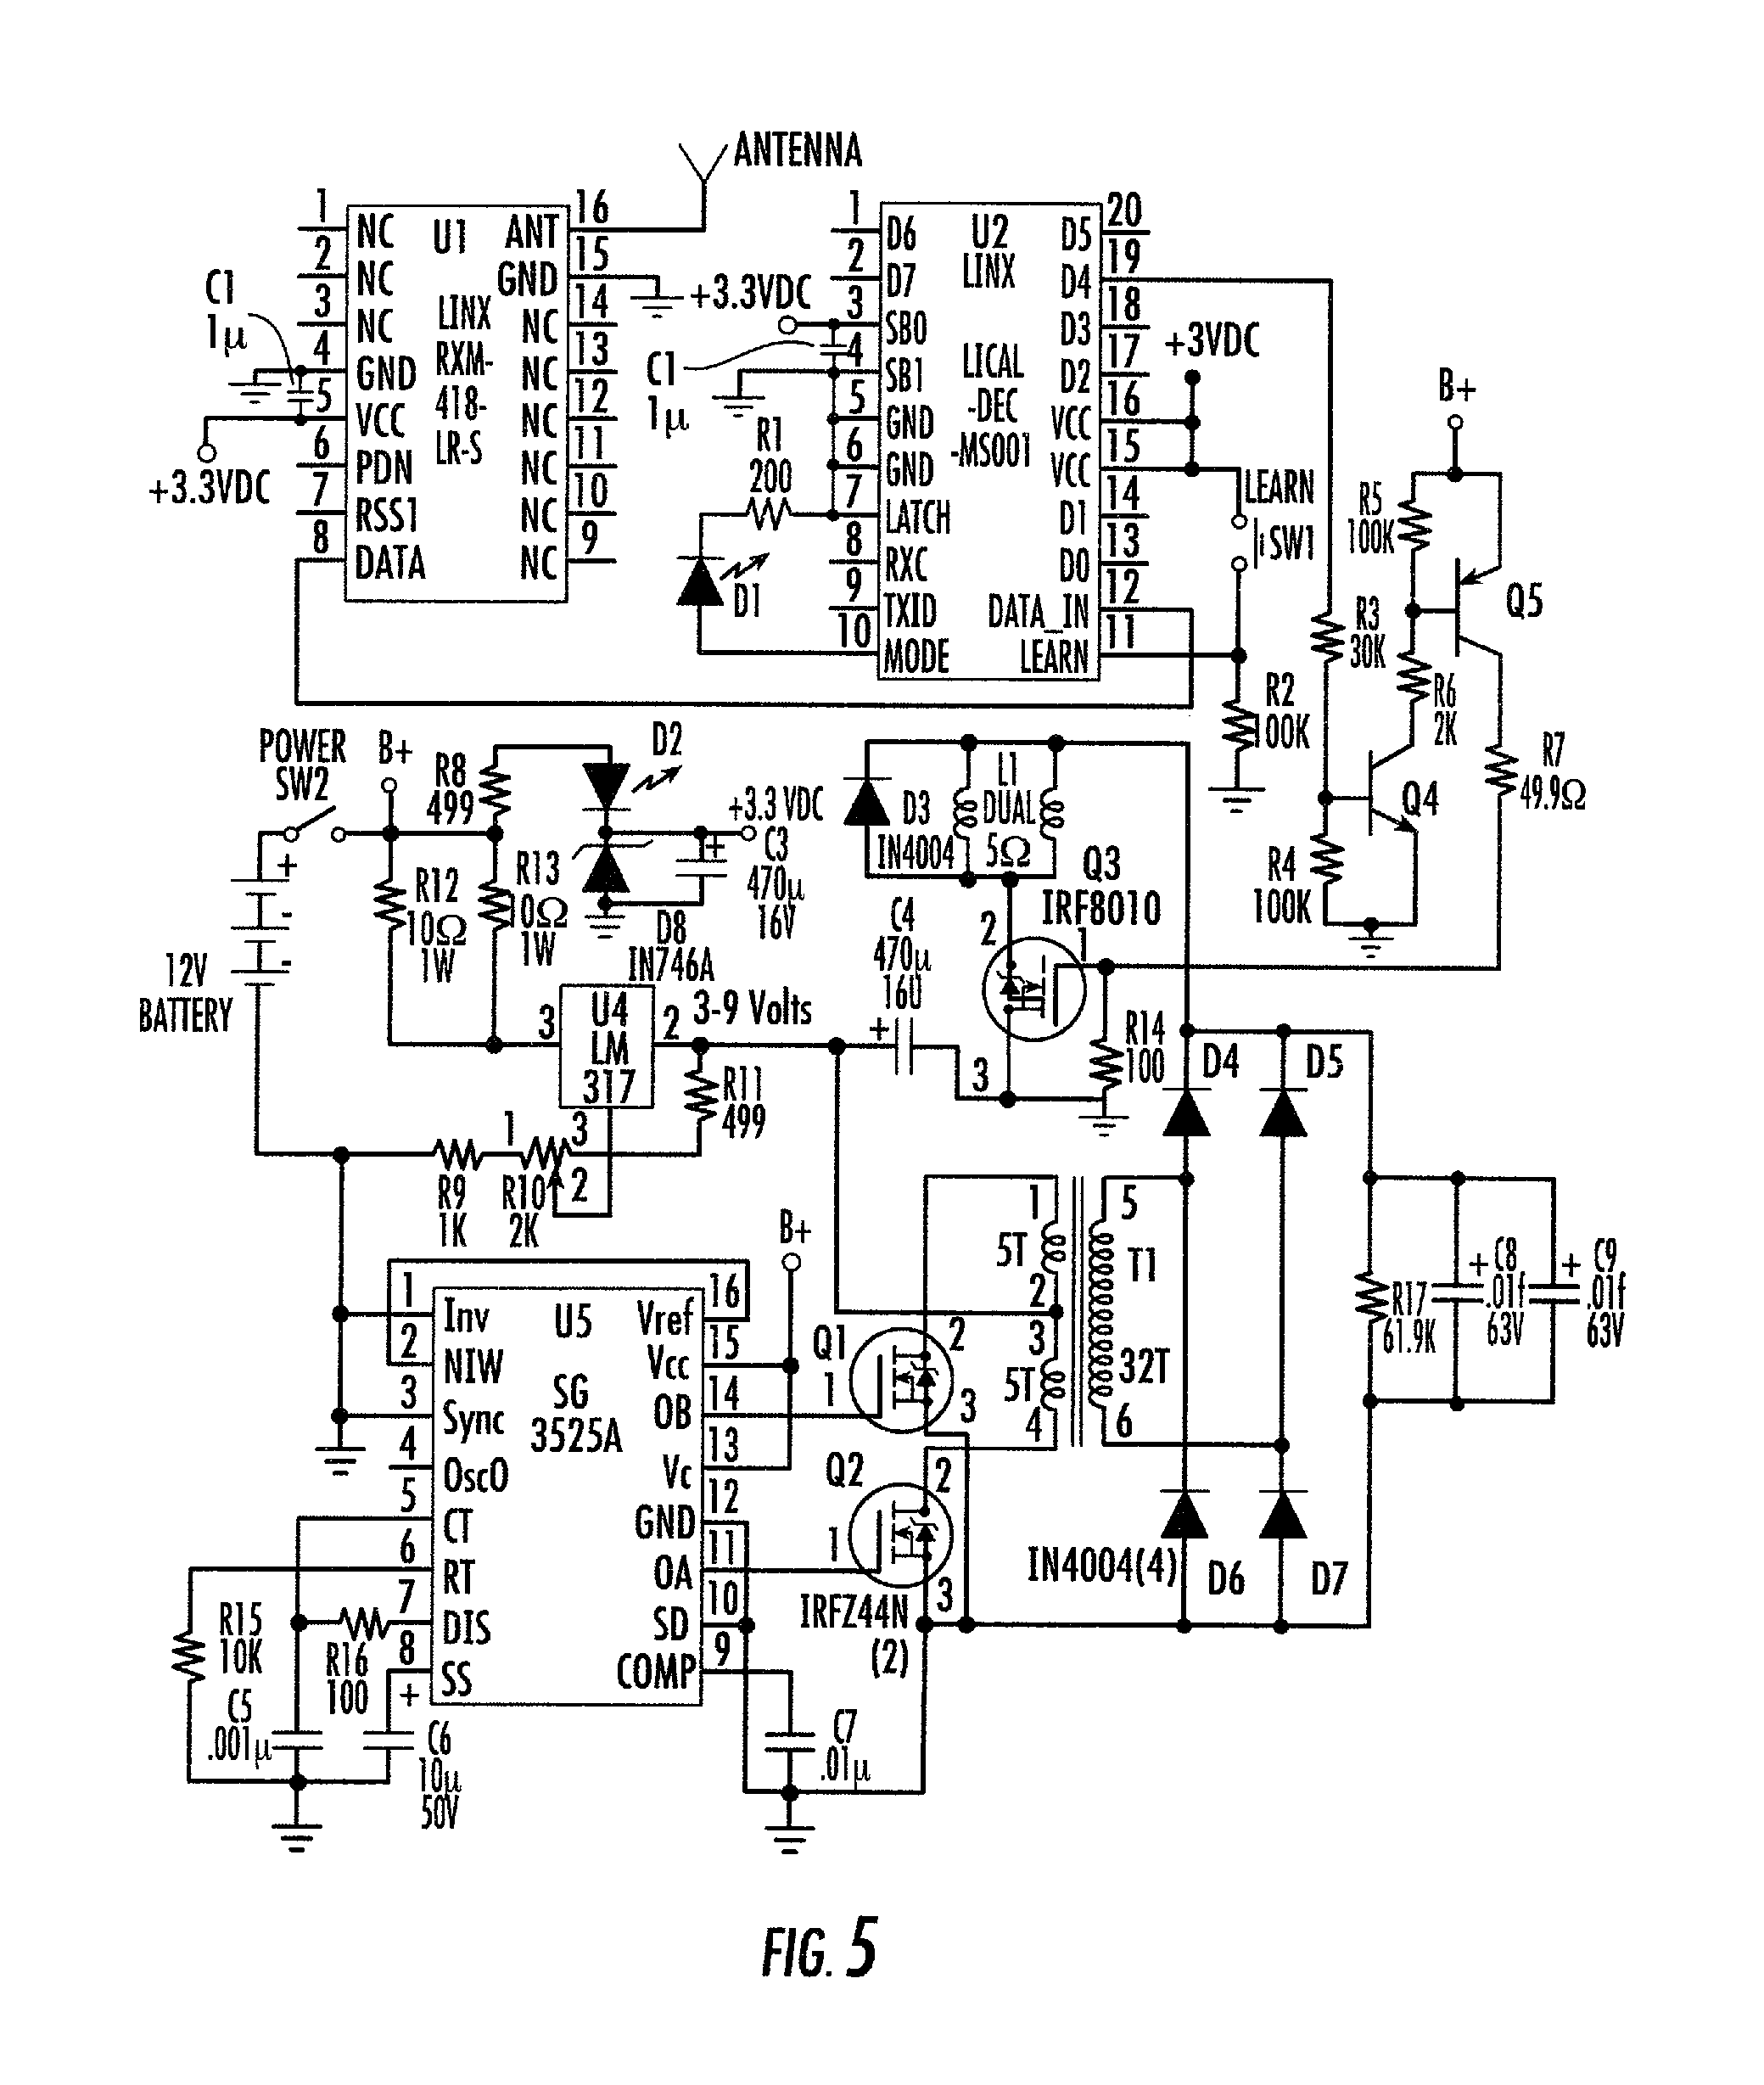 2000 saturn ls wiring diagram best wiring library 2002 Saturn Fuse Box Diagram 2000 saturn ls2 power window wiring diagram 2000 saturn ls2 wiring diagram 2000 saturn ls wiring